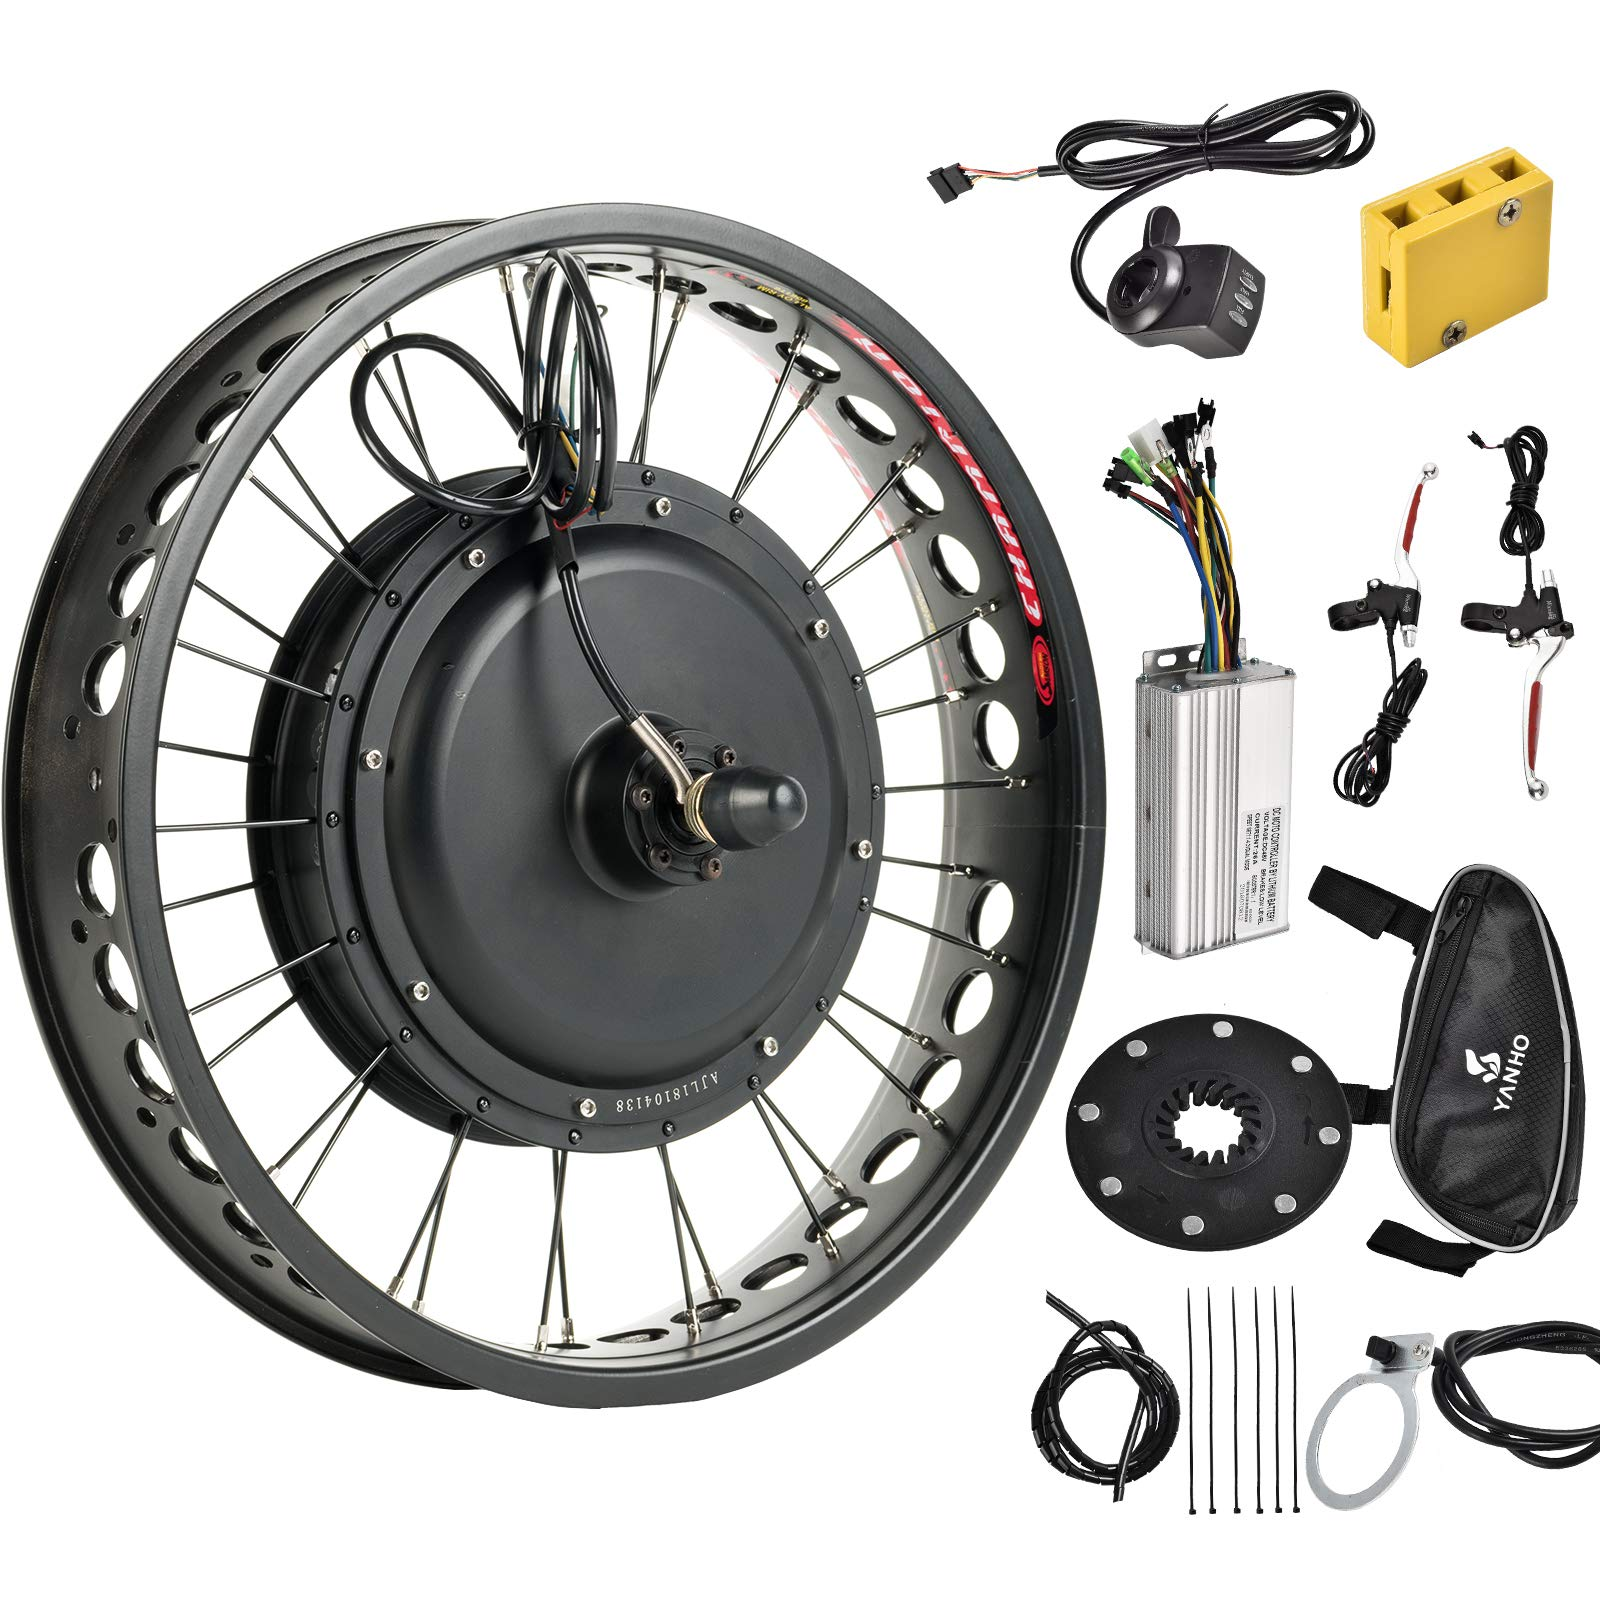 Murtisol Electric E-Bike Motor Kit 20'' Fat Tire Front Wheel 48V 1000W Bicycle Motor Conversion Kit